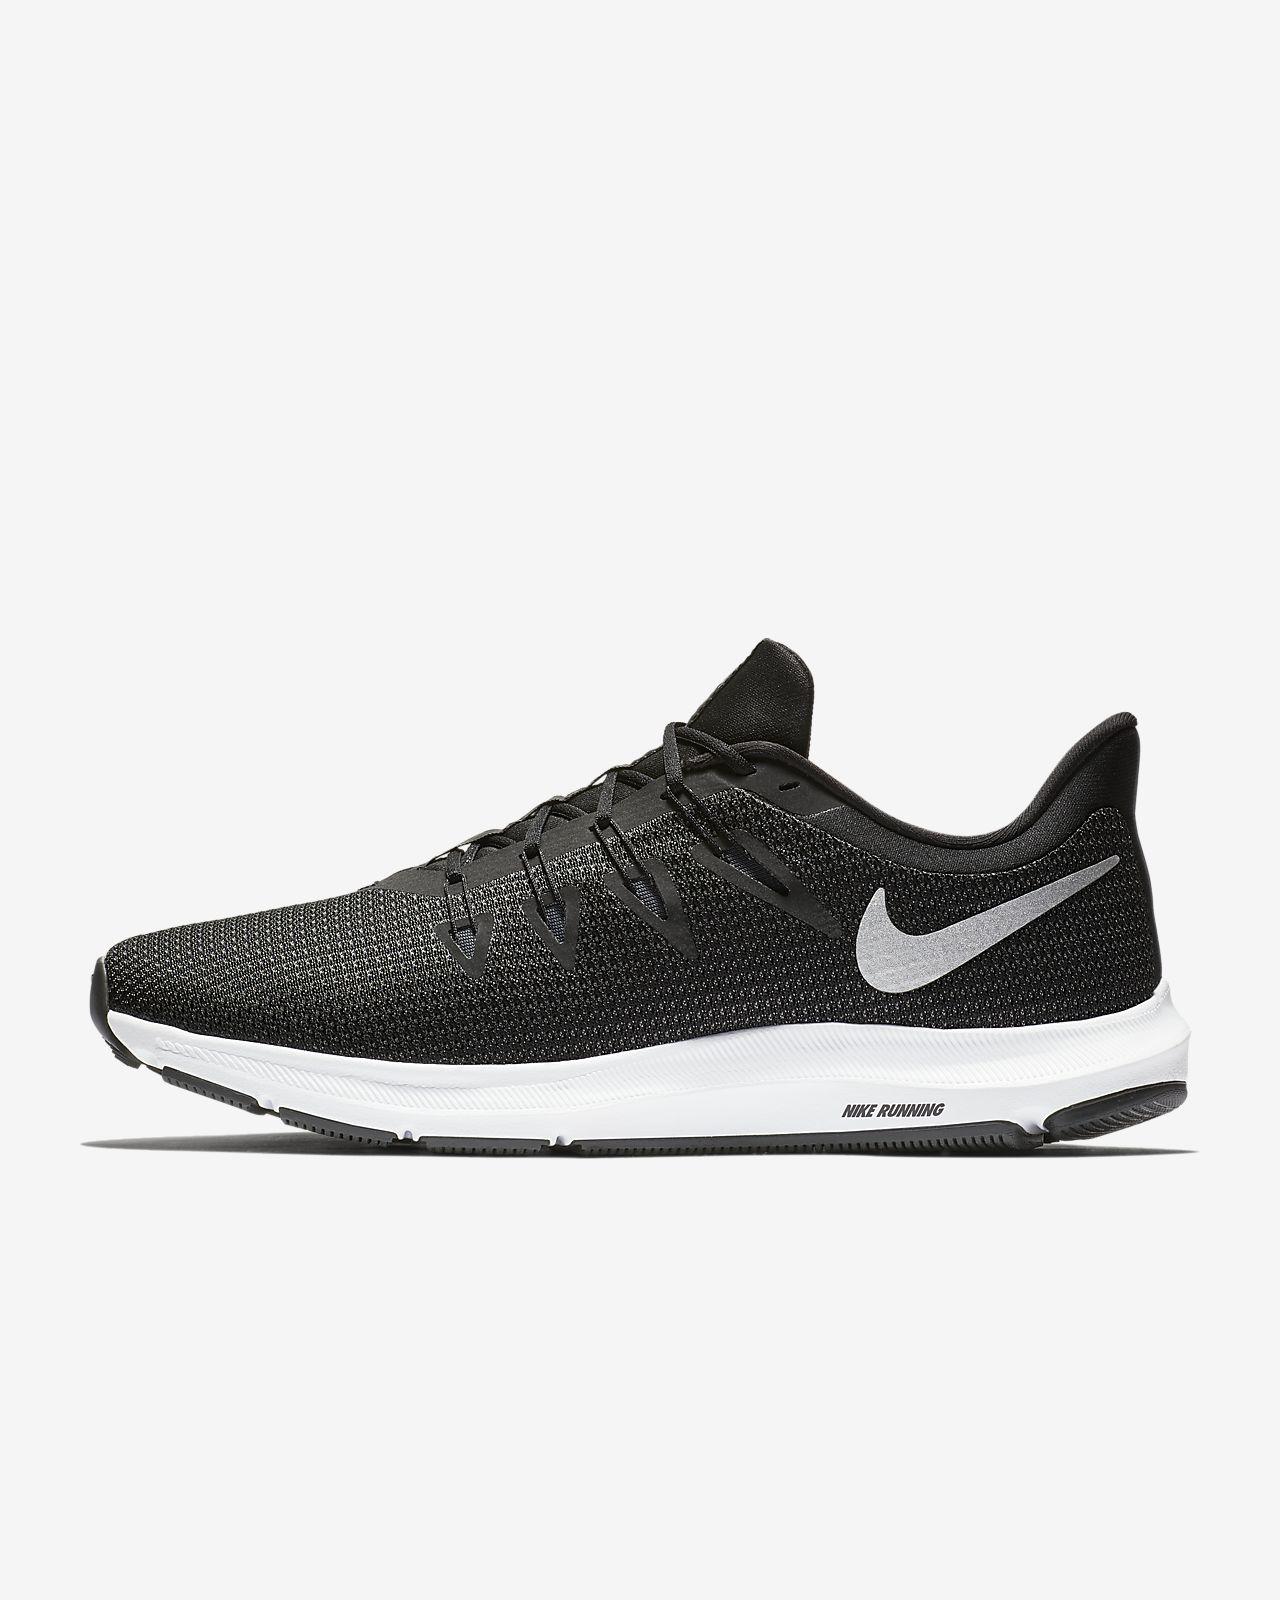 1a87f91208 Chaussure de running Nike Quest pour Homme. Nike.com FR